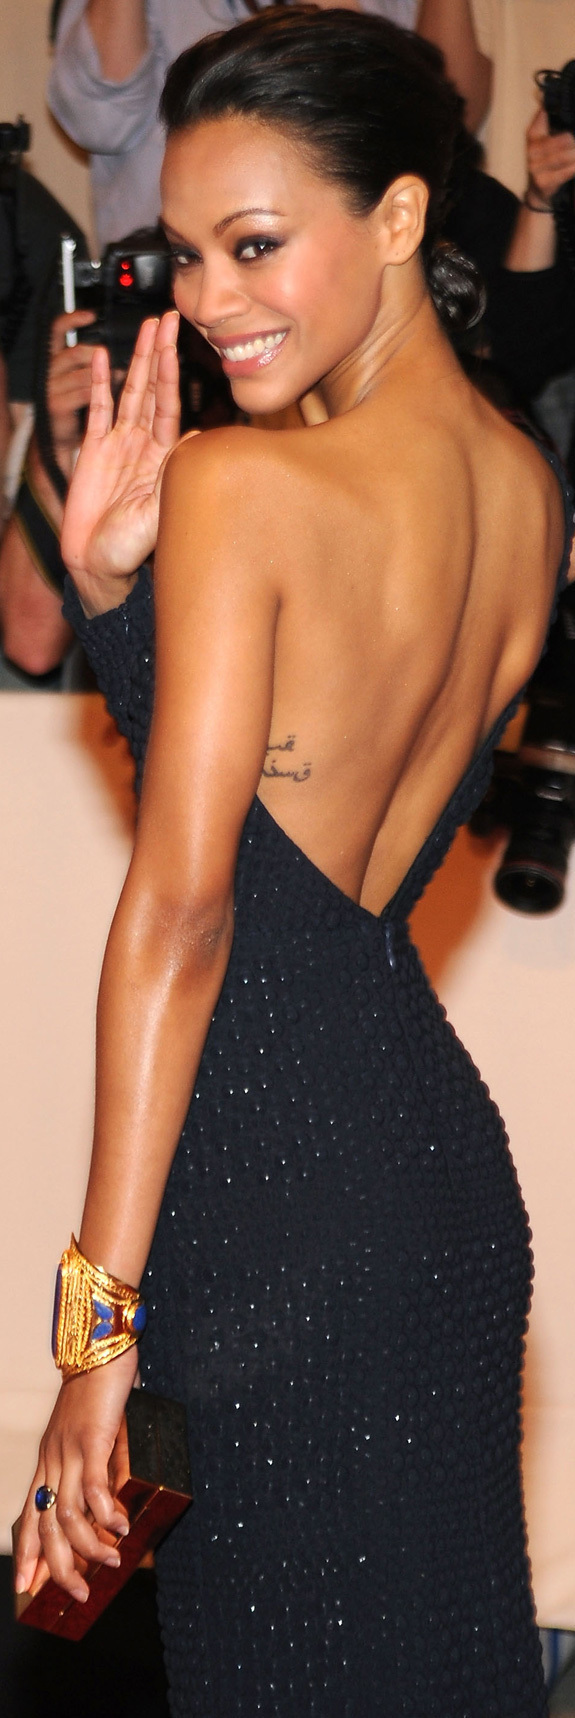 Zoe Saldana Tattoo